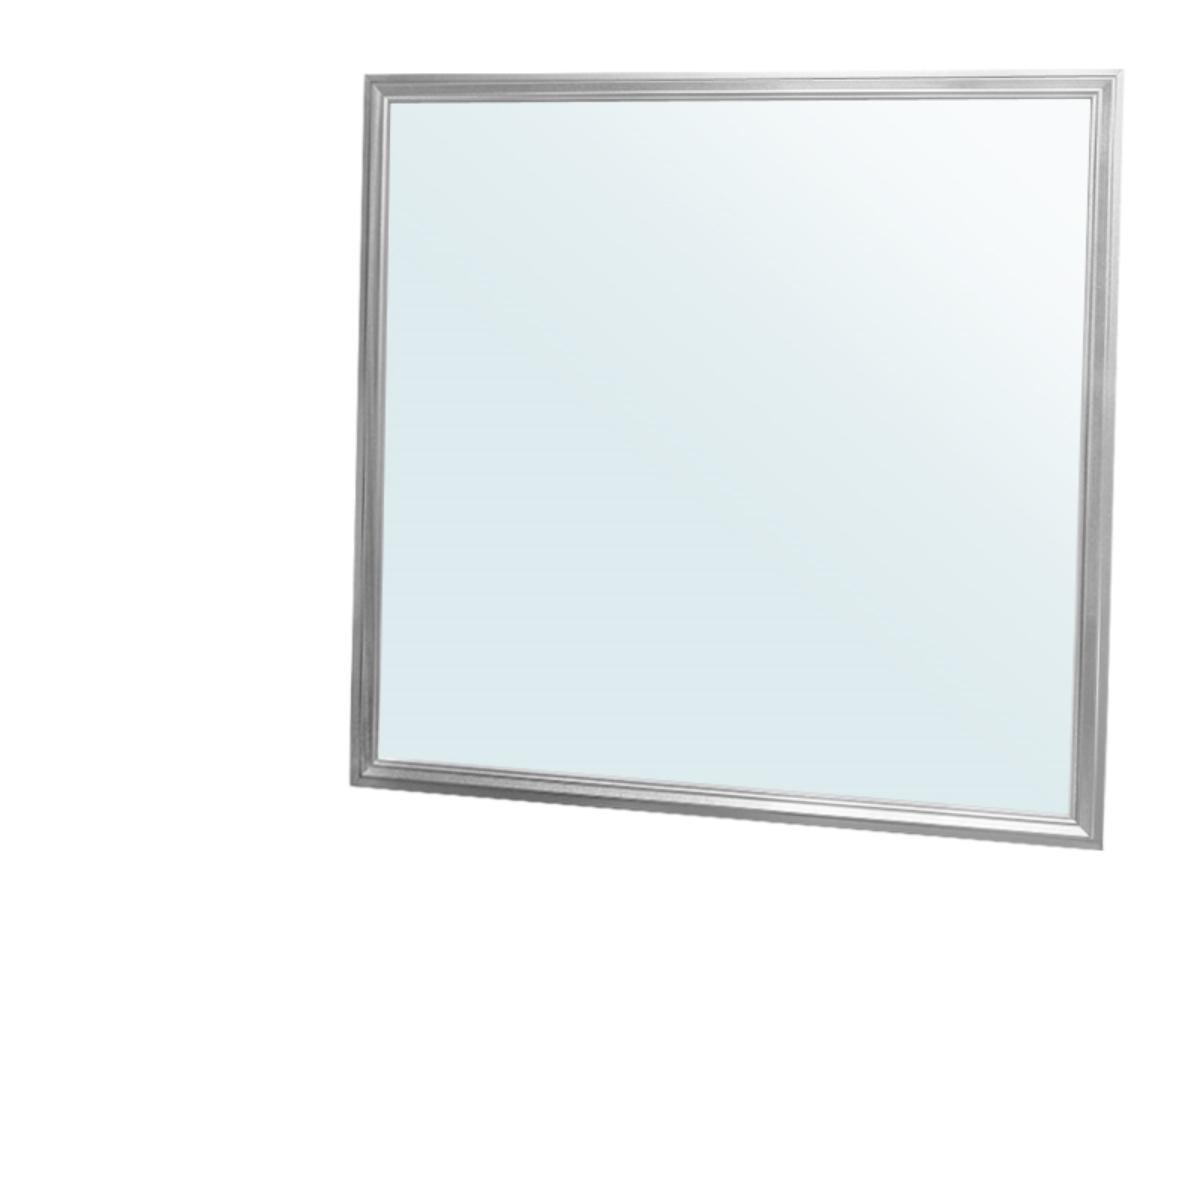 Panel-de-techo-LED-60x60-luz-36W-encastrable-tienda-oficina-LED-3000-4000-6000K